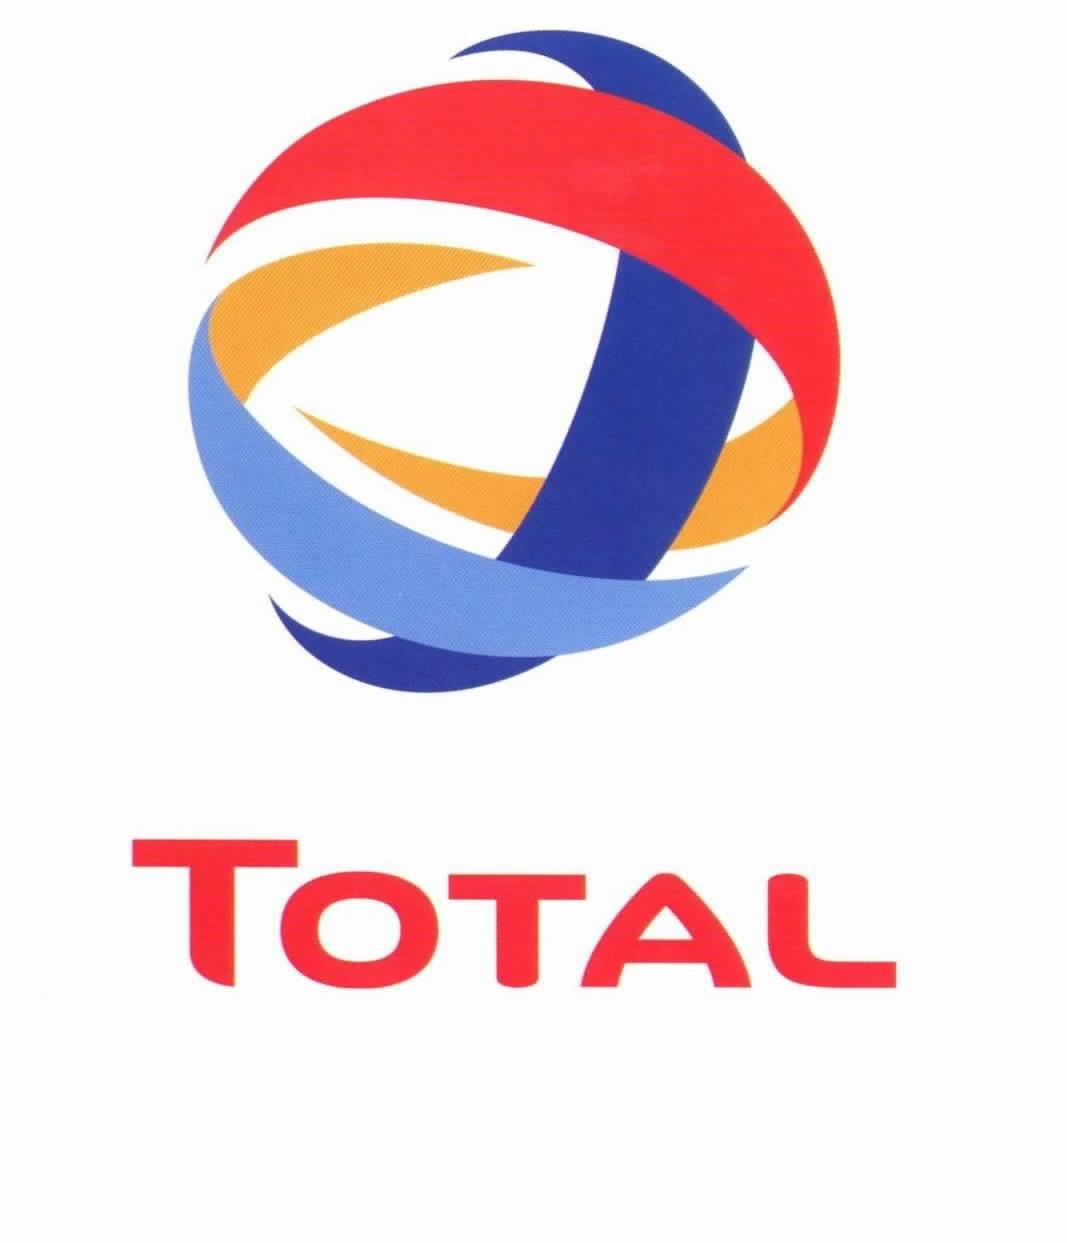 Total logo wallpapers HD